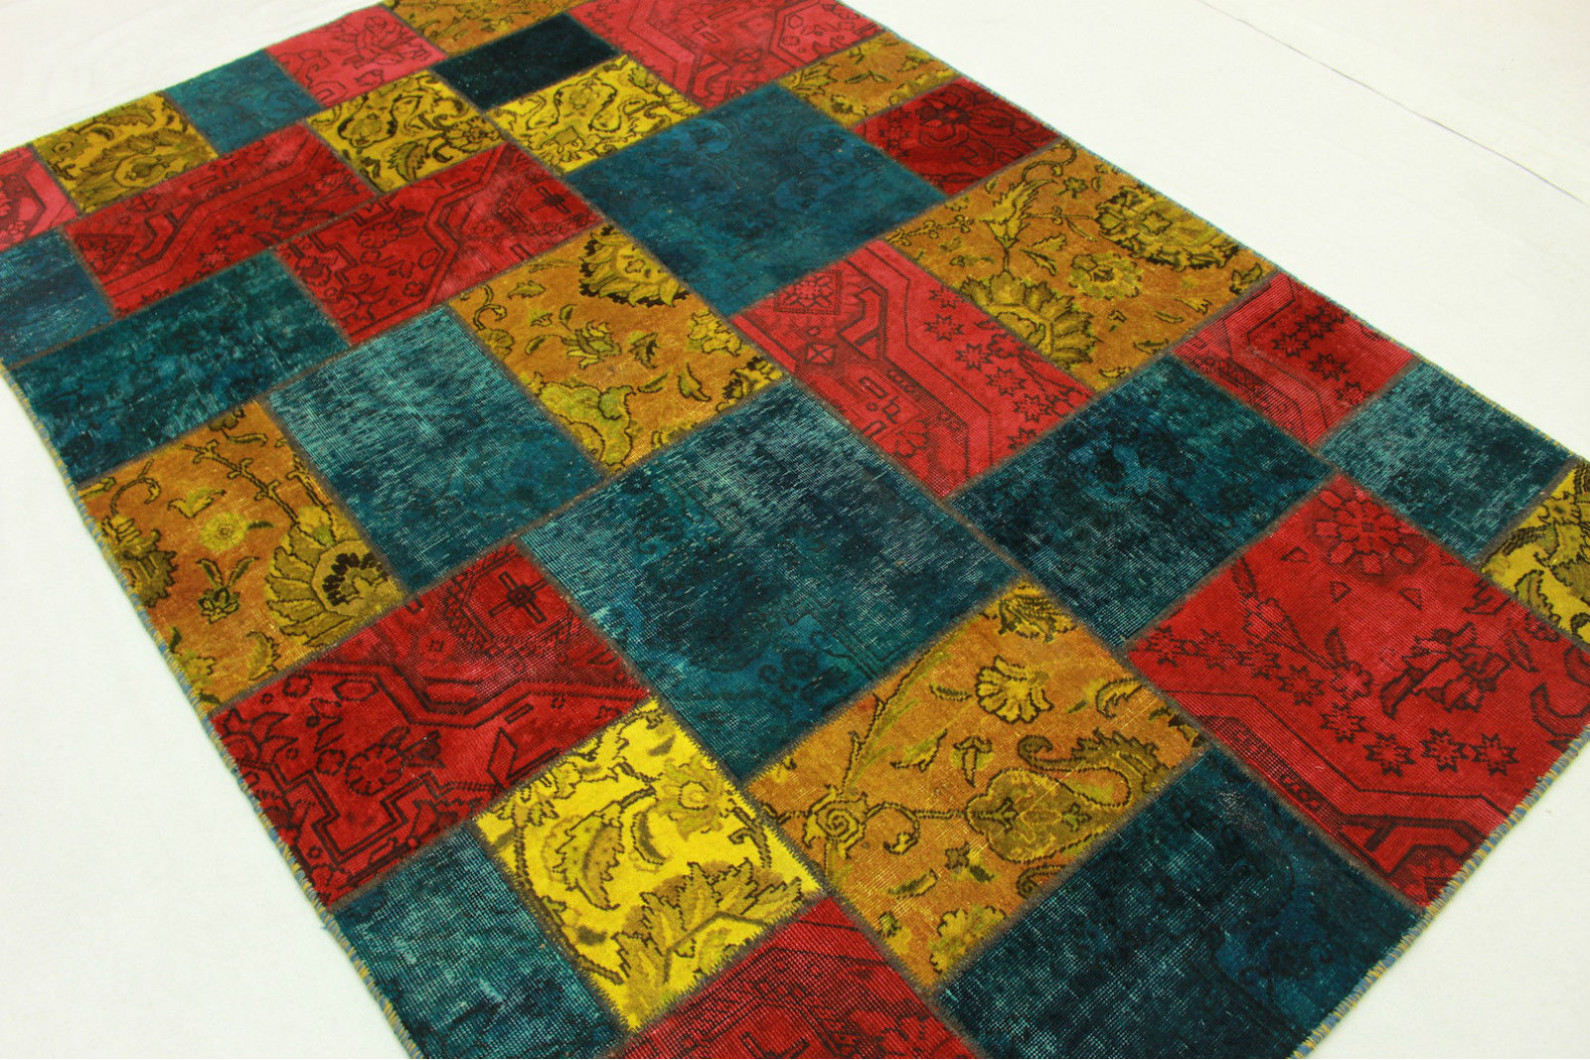 patchwork teppich rot t rkis gelb in 240x170cm 1001 1996 bei kaufen. Black Bedroom Furniture Sets. Home Design Ideas